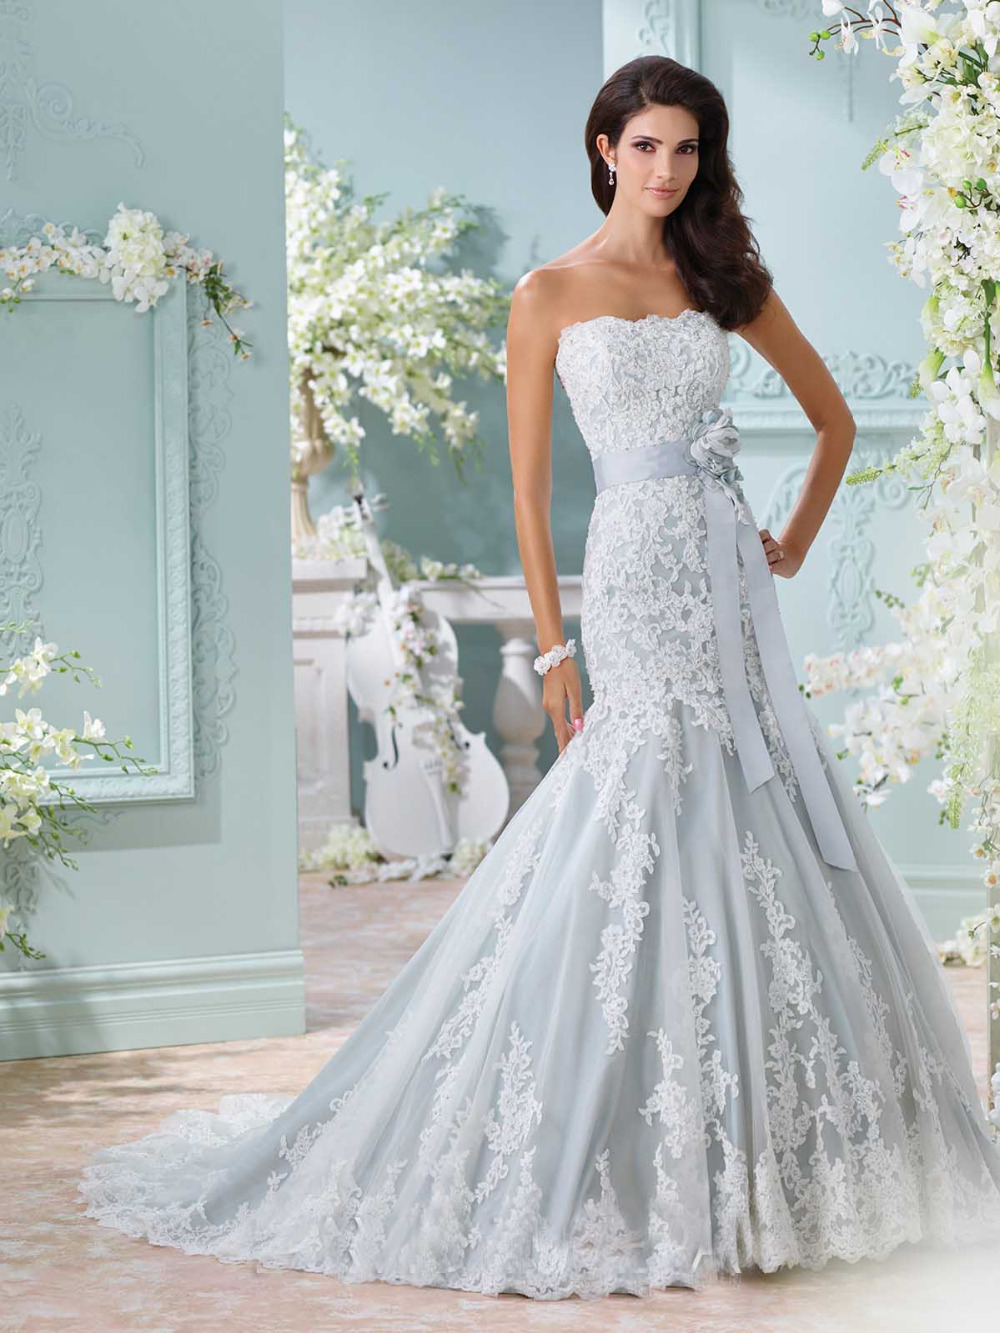 Amazing Black Corset Wedding Dresses Ideas - All Wedding Dresses ...